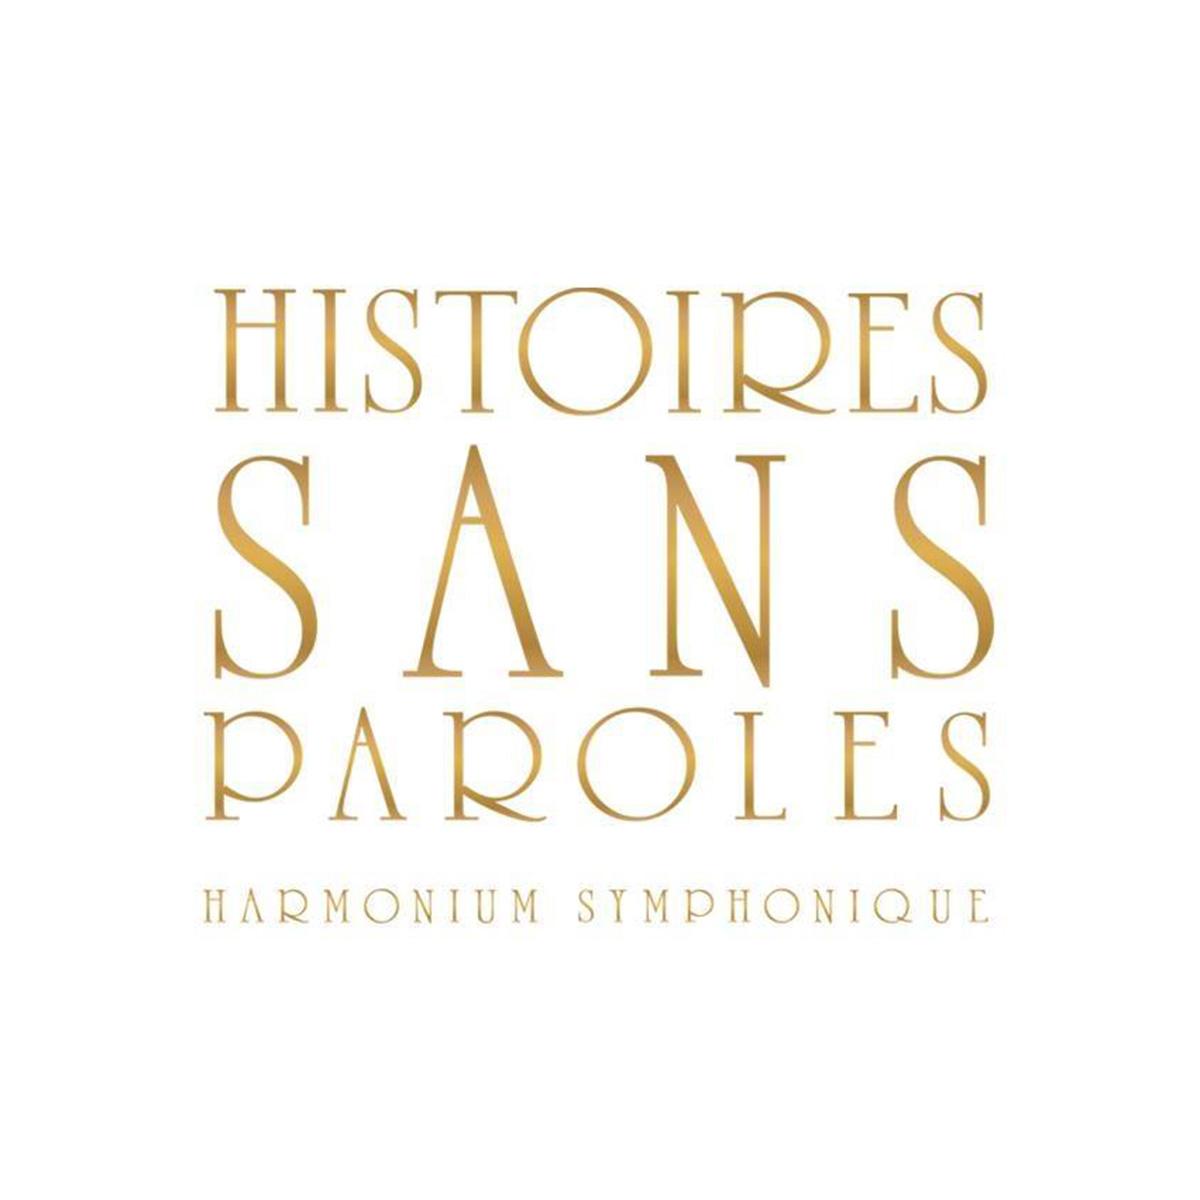 Harmonium Goes Symphonic After 44 Years!